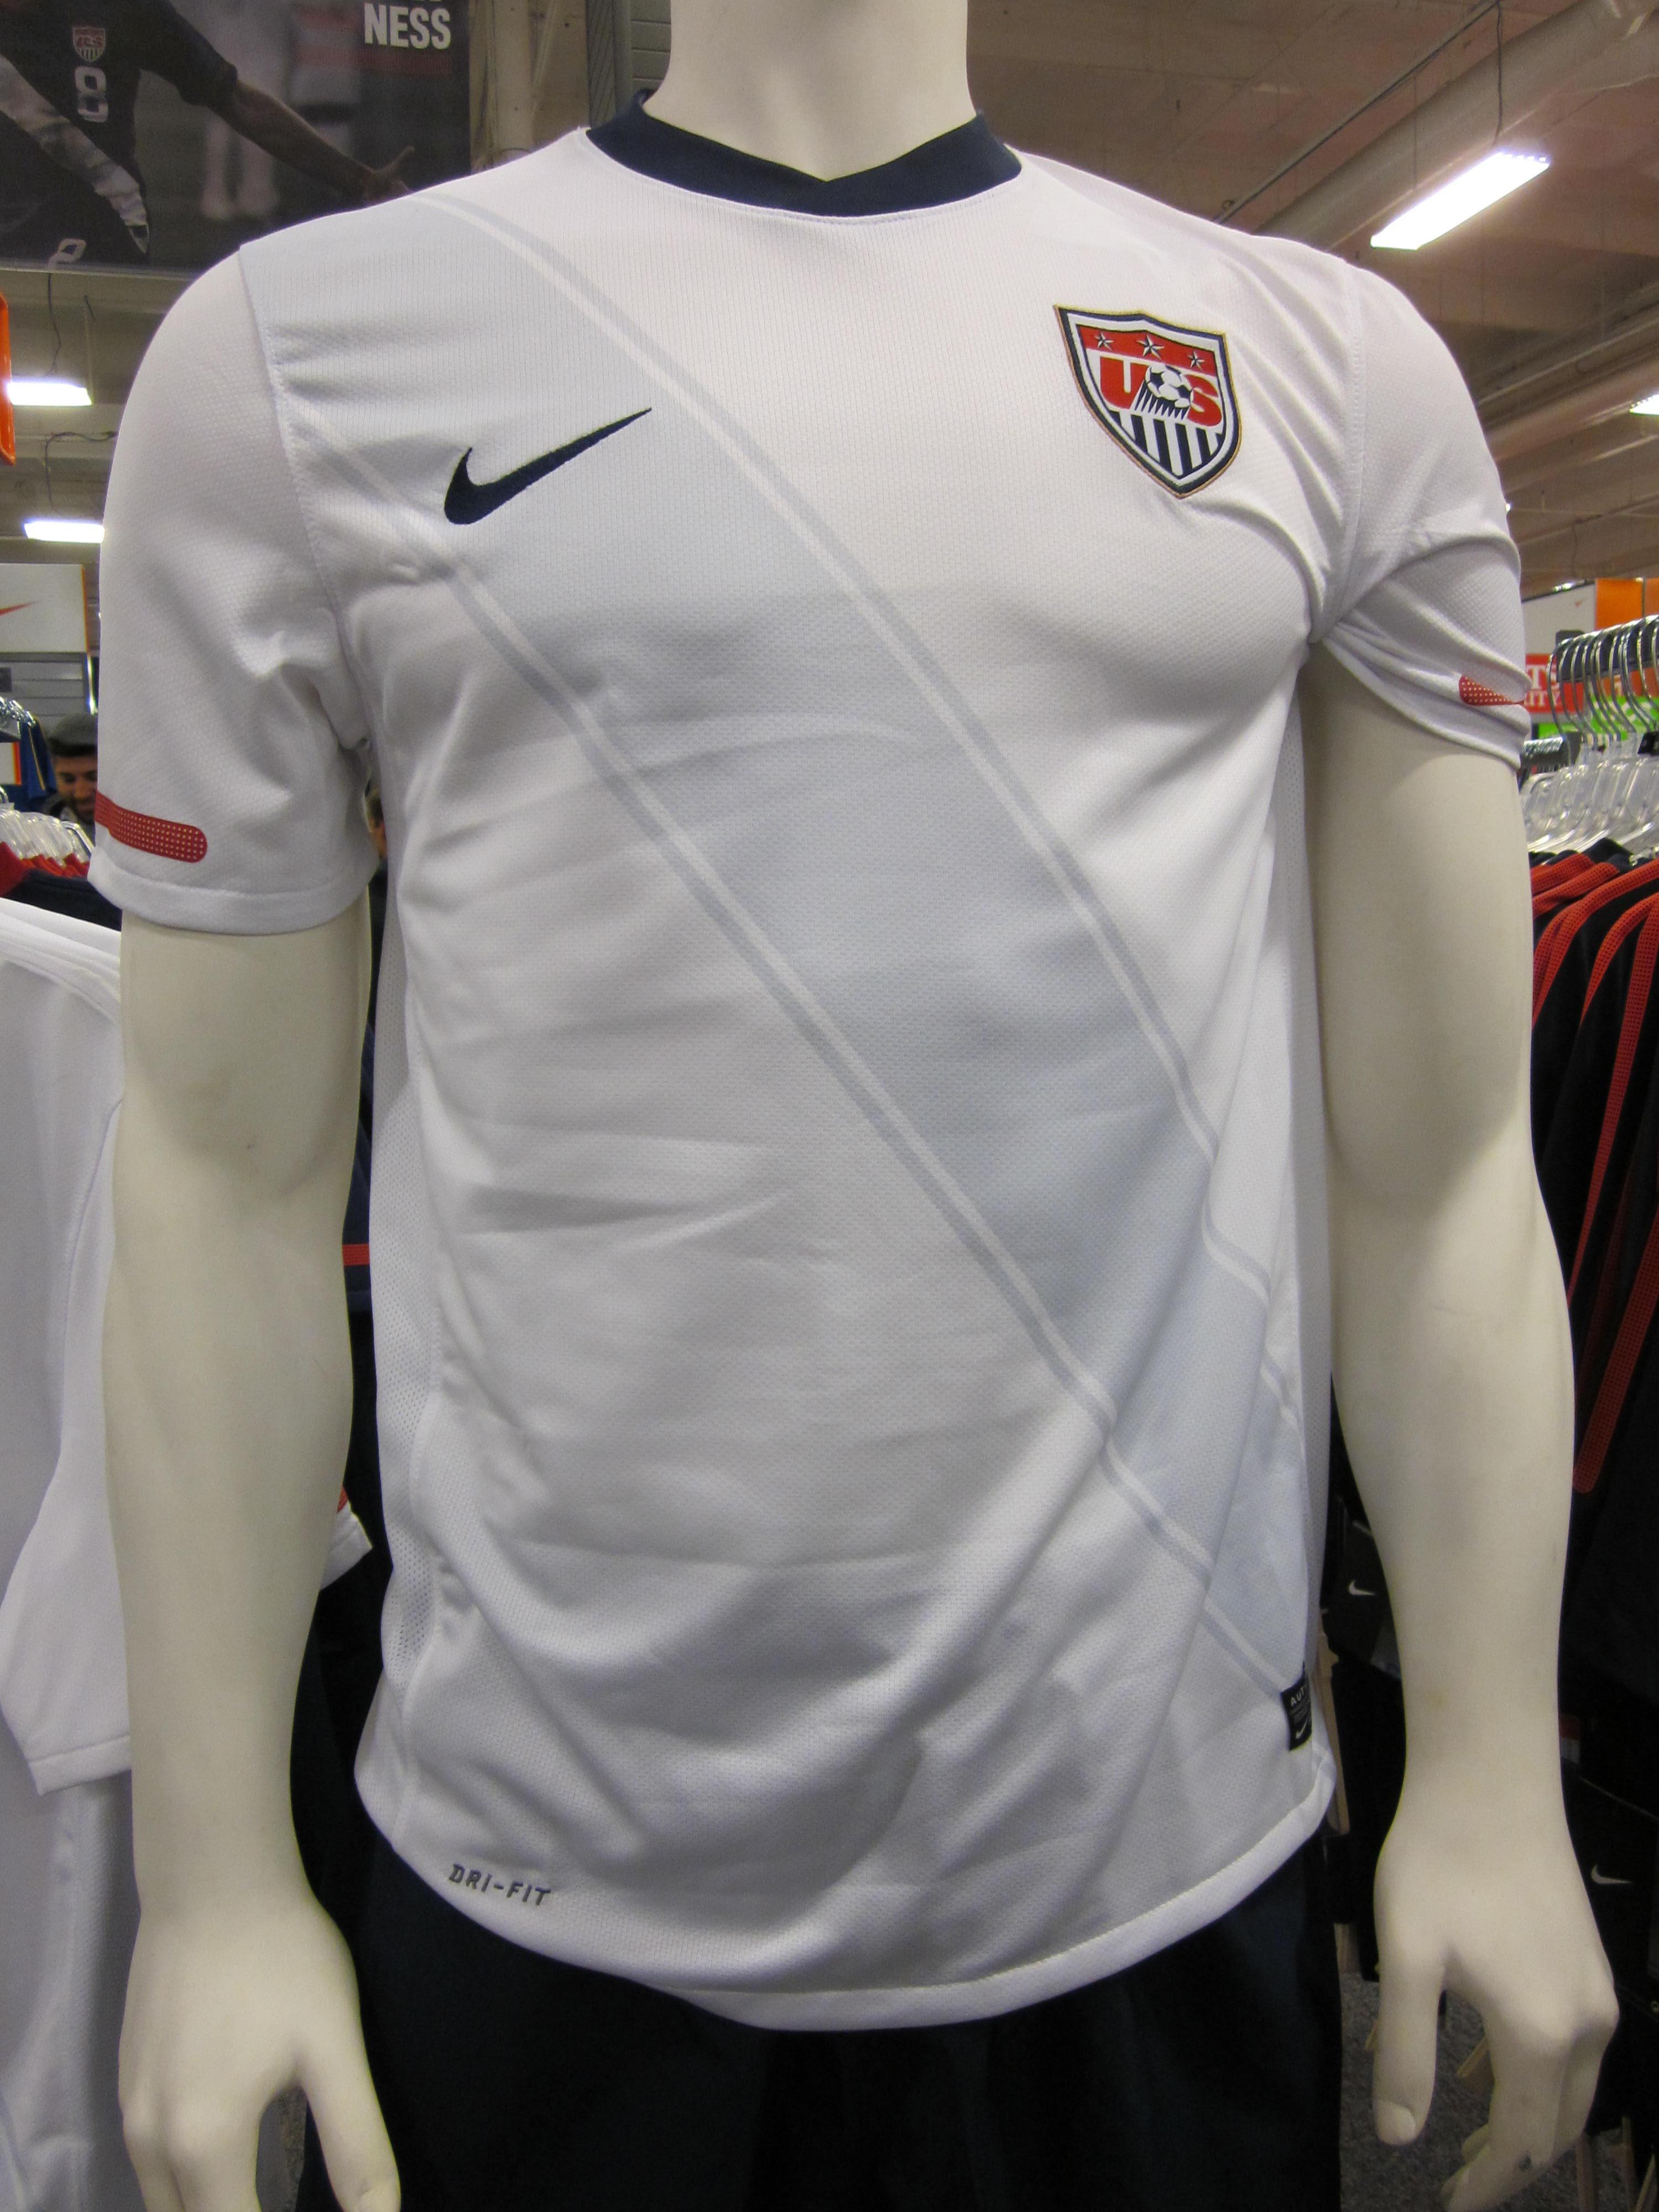 efc4b38846b1b File:Nike USA national soccer team home jersey.JPG - Wikimedia Commons